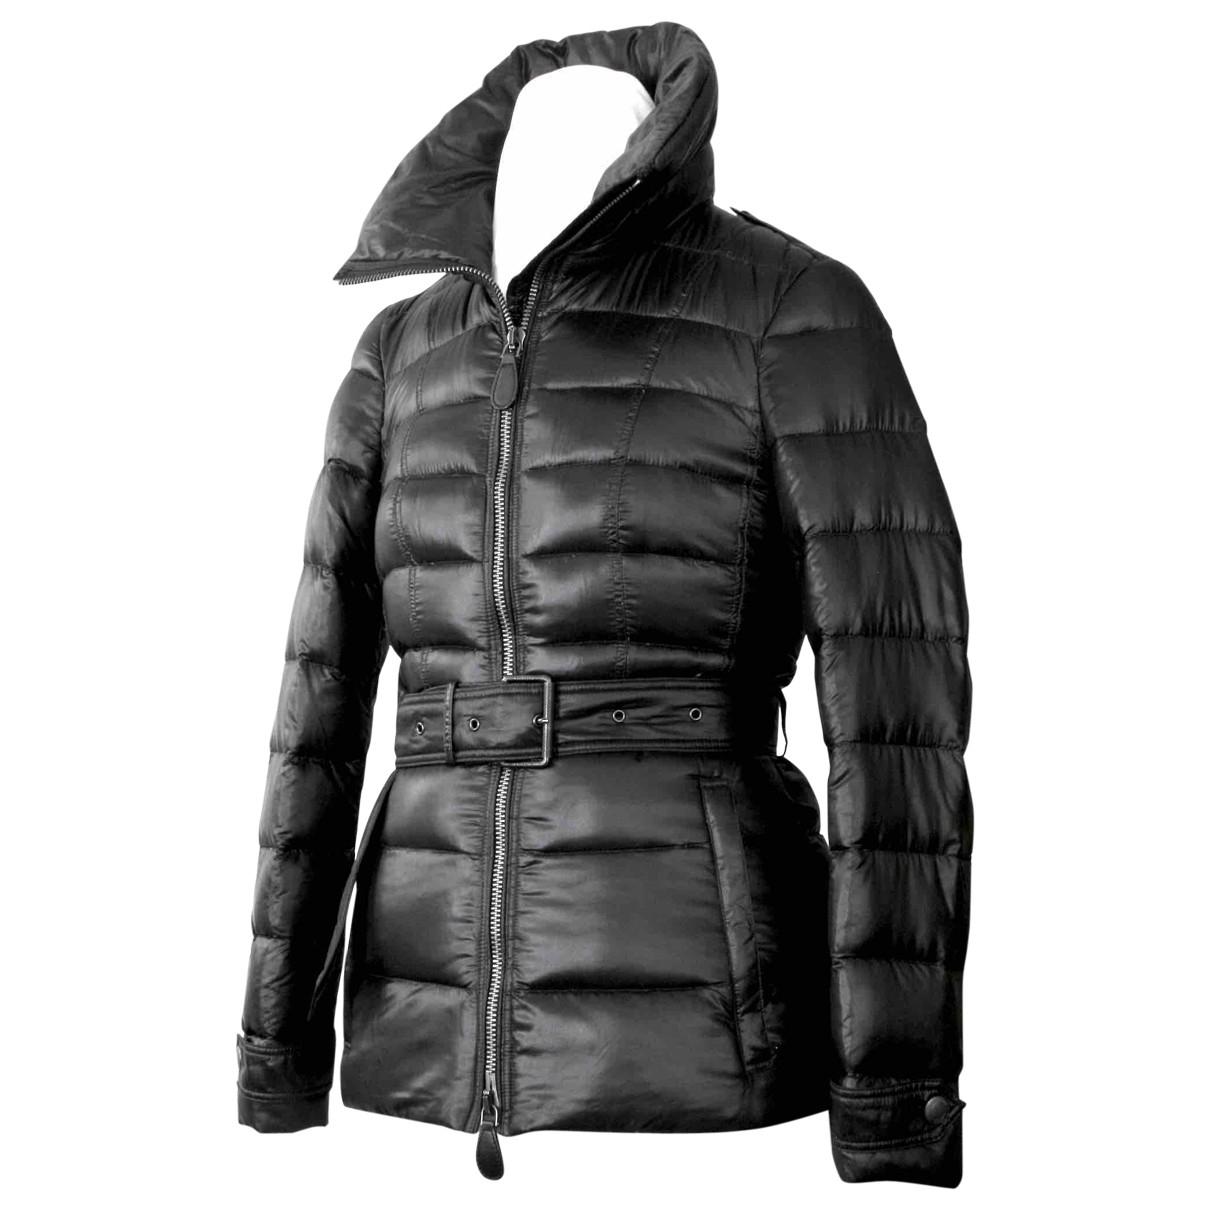 Burberry \N Black coat for Women XS International